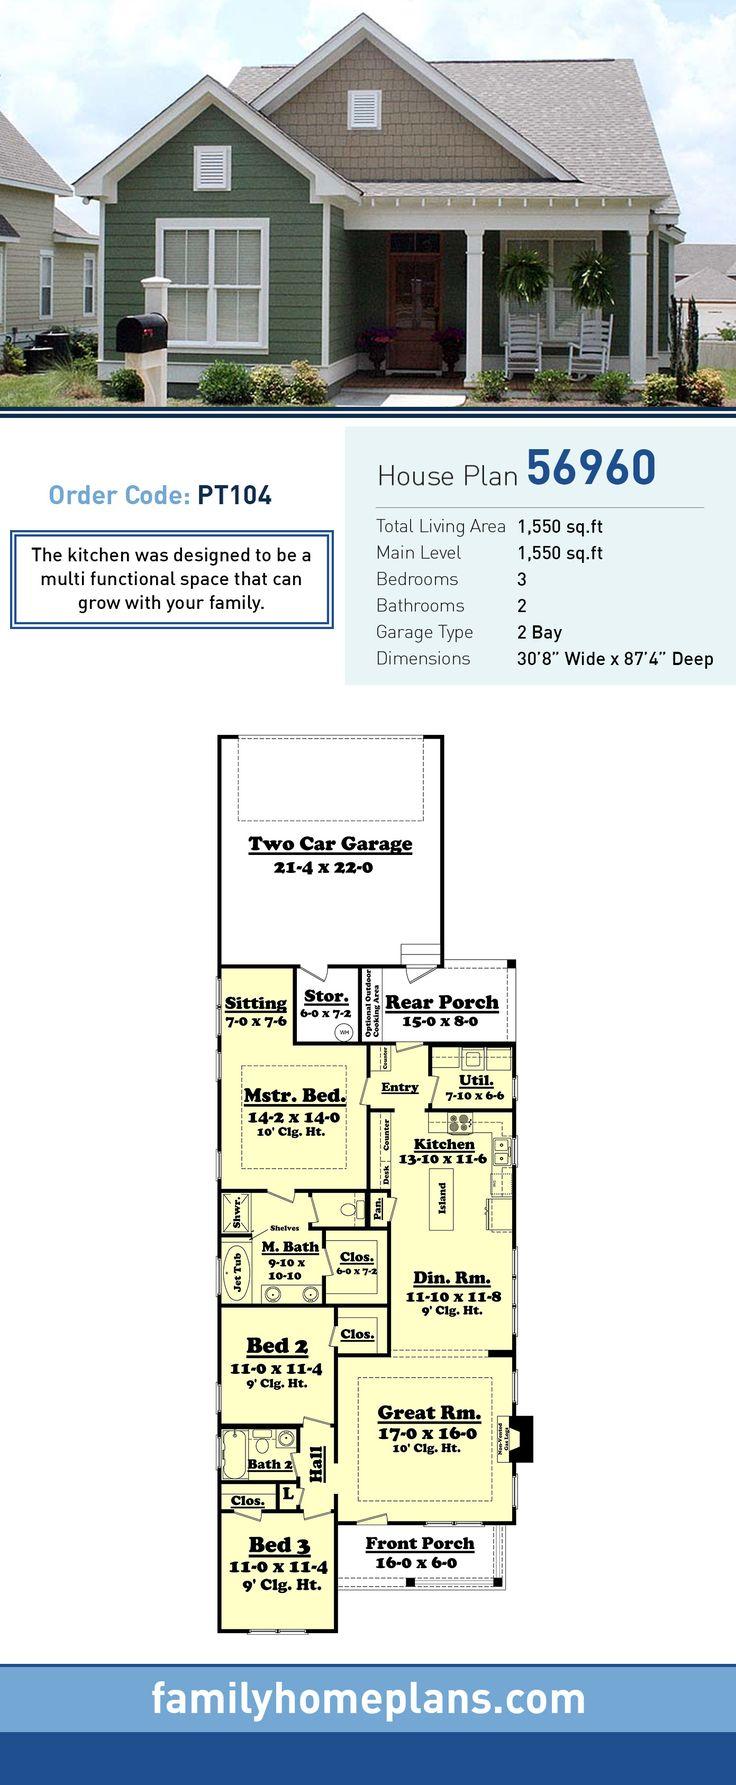 Best 25 narrow house ideas on pinterest narrow house for 2 family house plans narrow lot